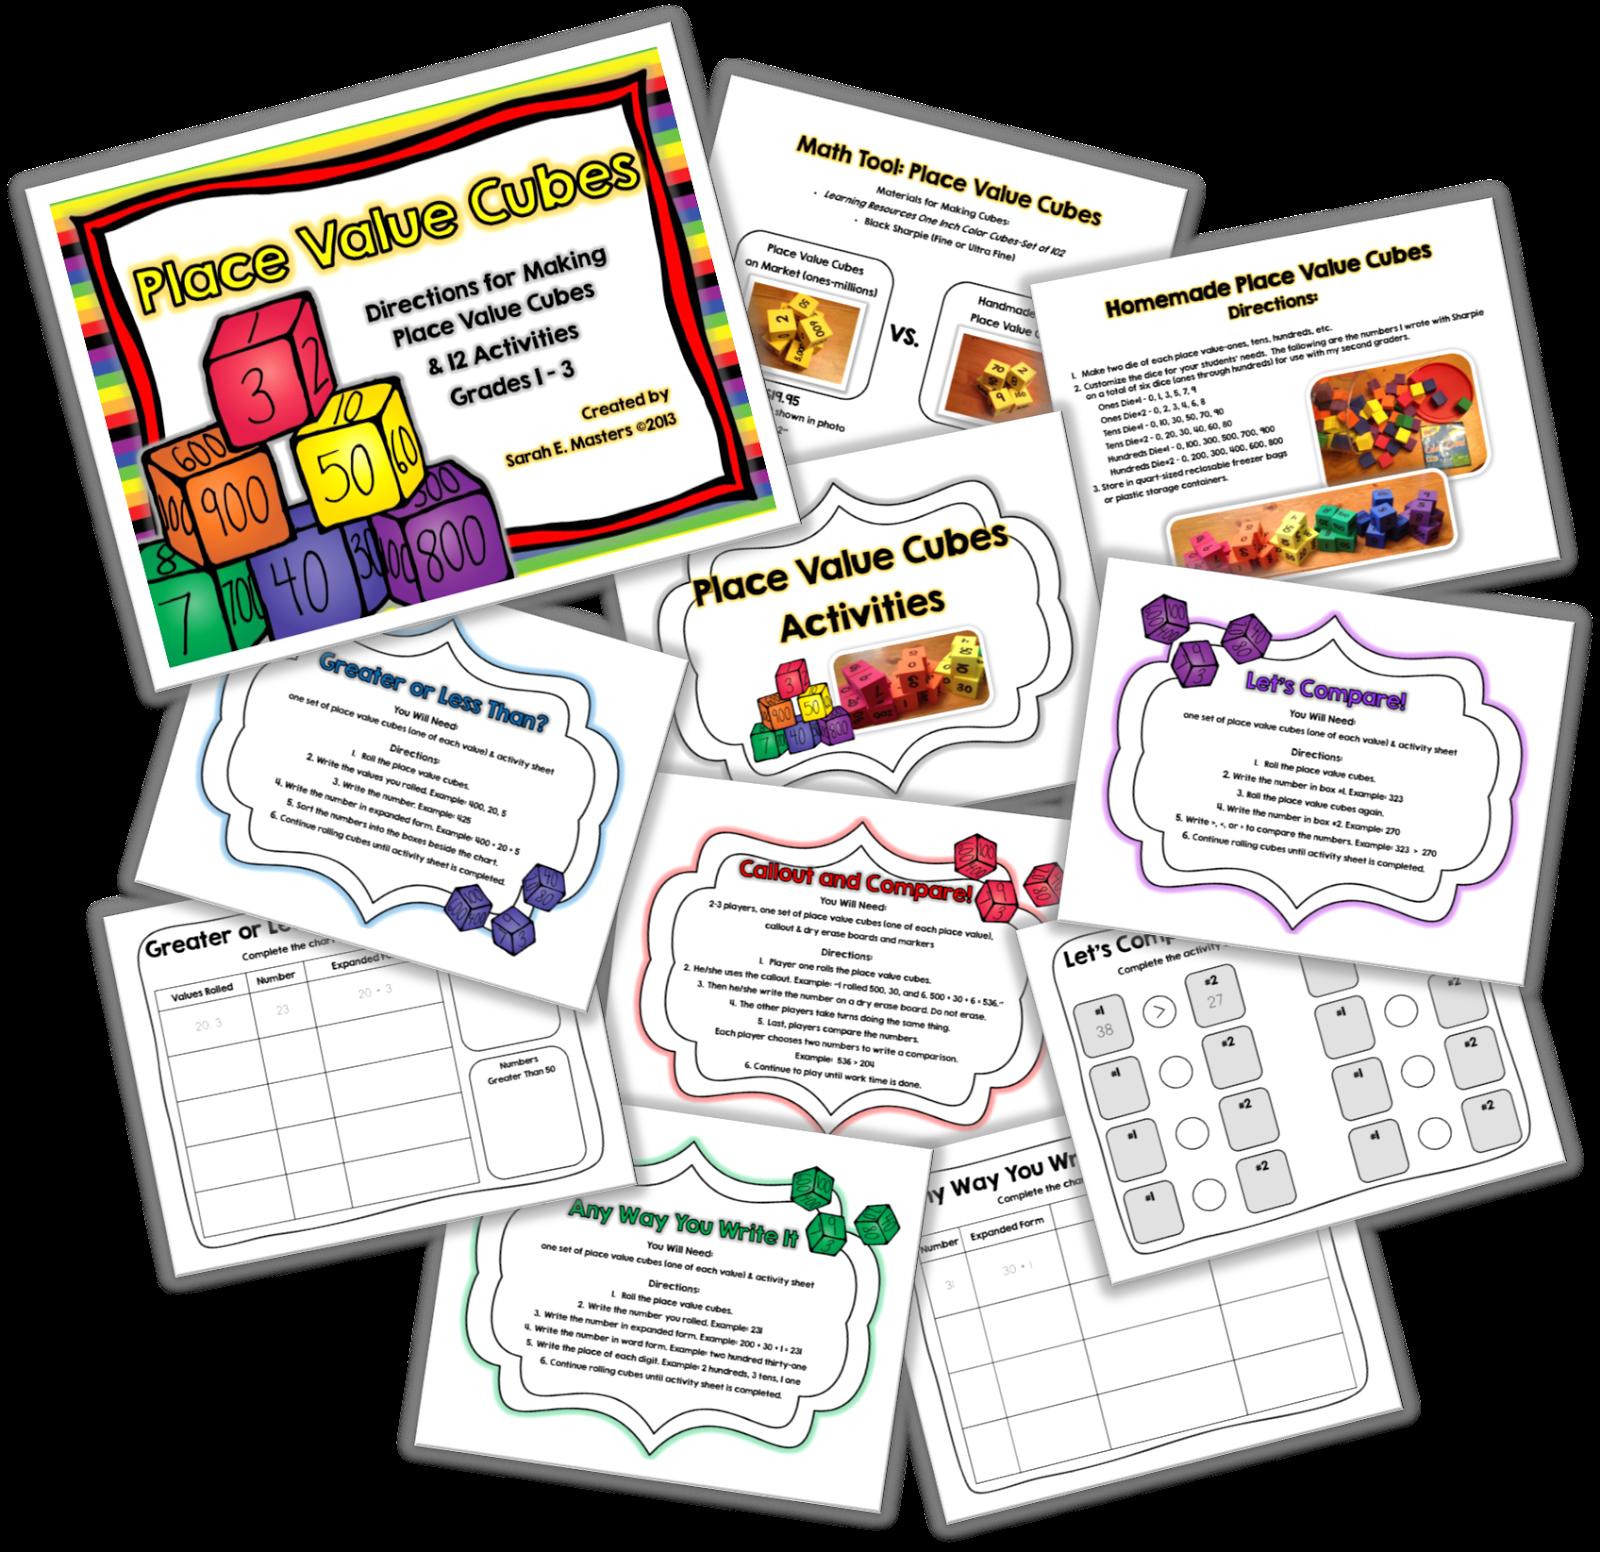 http://www.teacherspayteachers.com/Product/12-Place-Value-Cube-Activities-How-to-Make-Them-773266